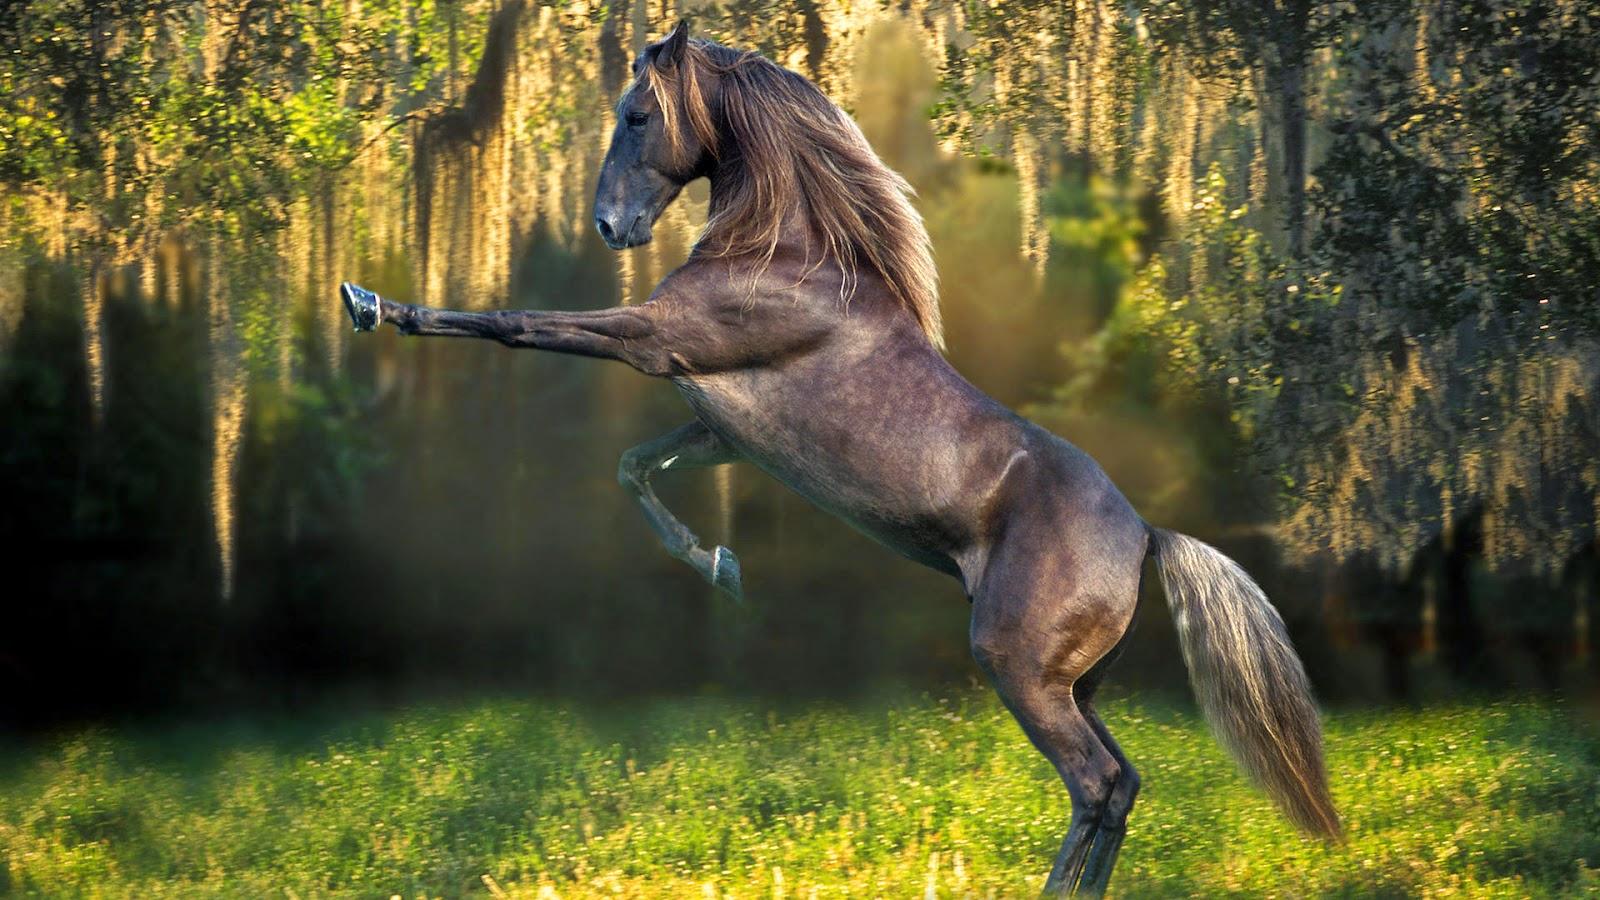 Wonderful   Wallpaper Horse Samsung Galaxy - Horse%2BHD%2BWallpapers%2B(12)  Perfect Image Reference_69532.jpg